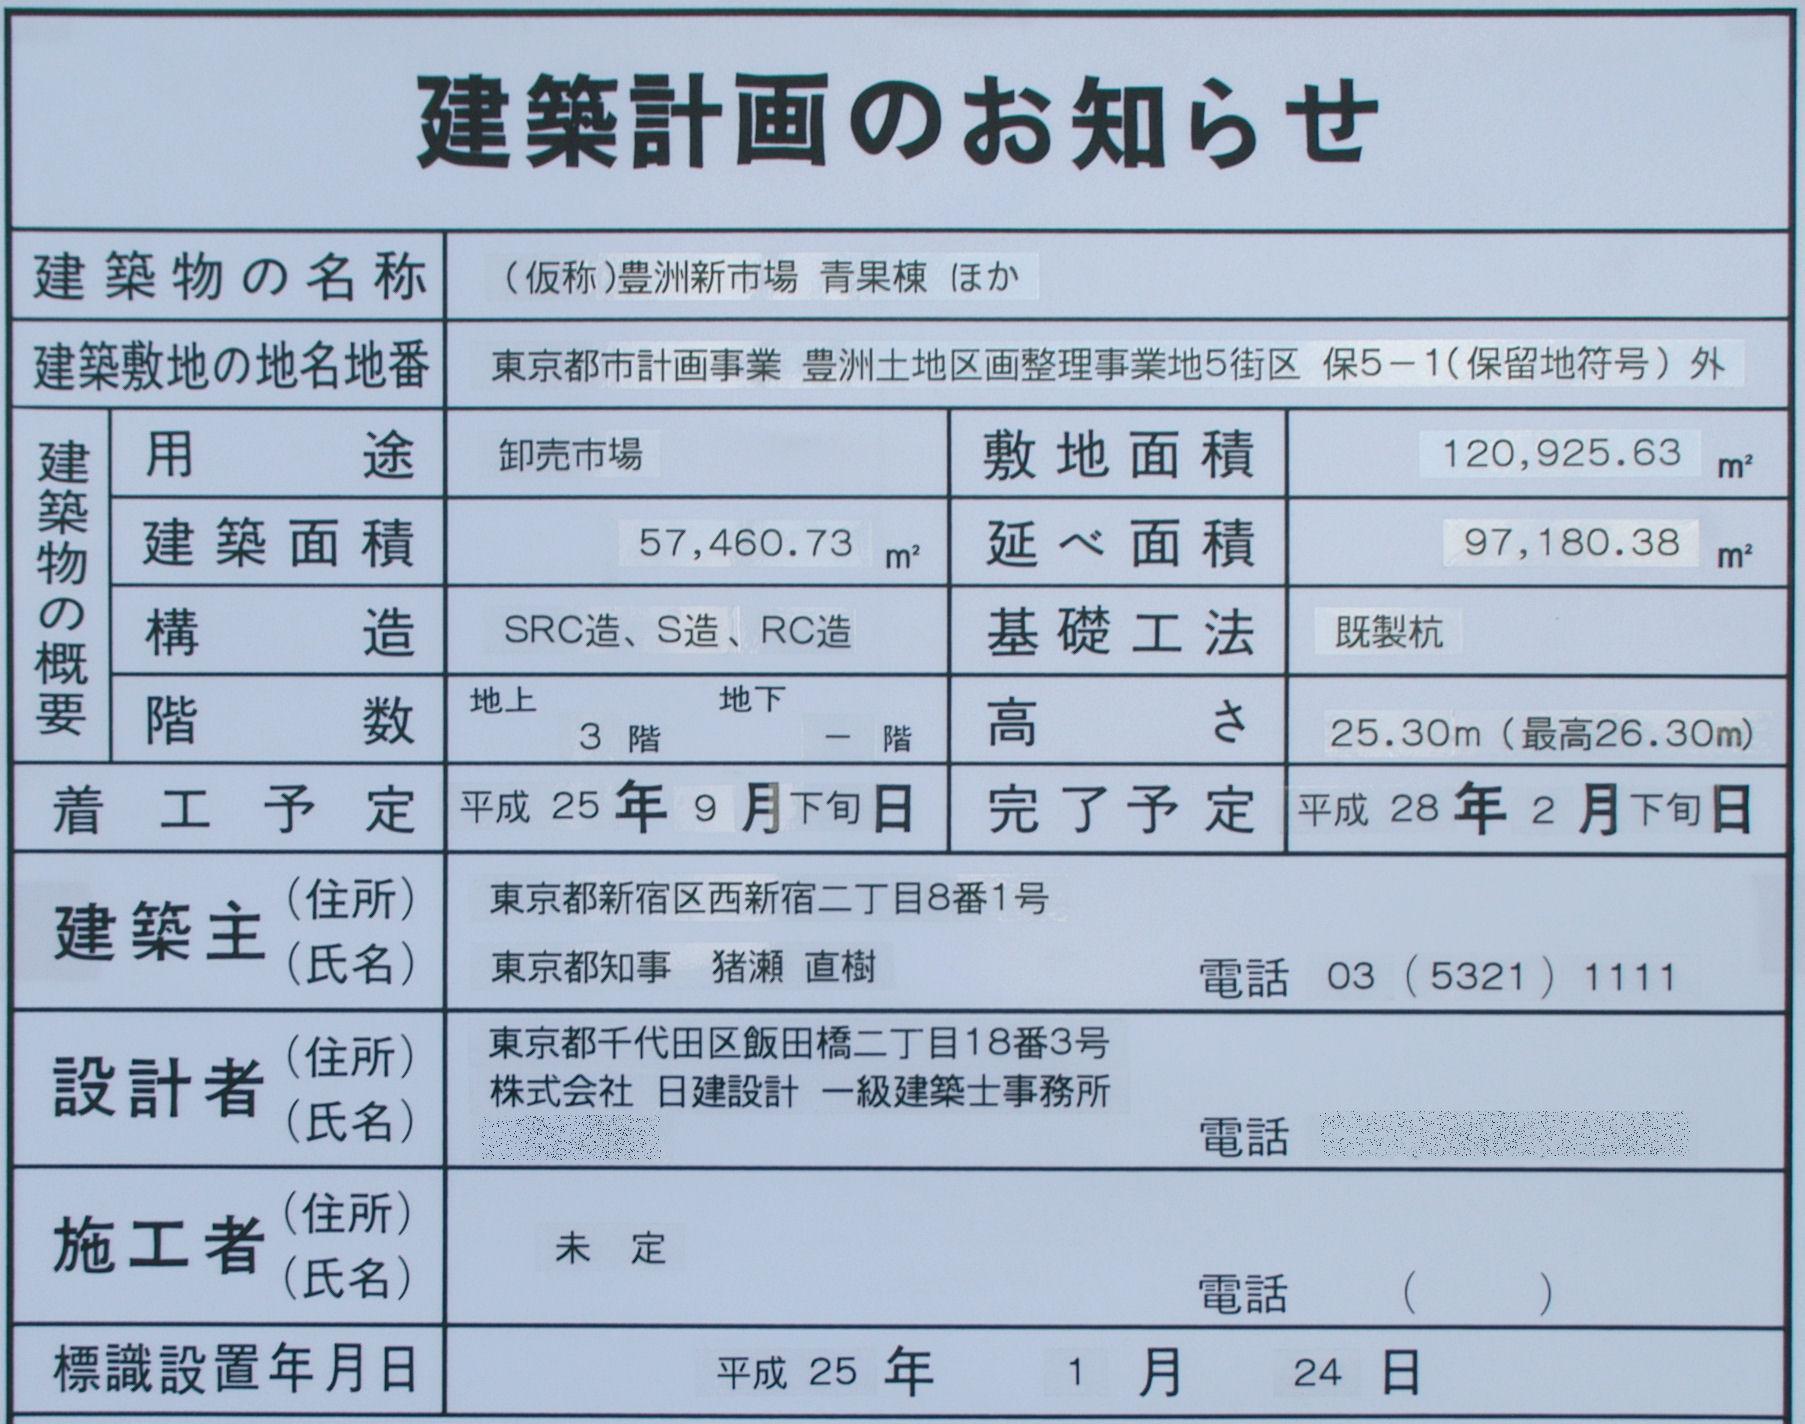 toyosuma1301k249.jpg